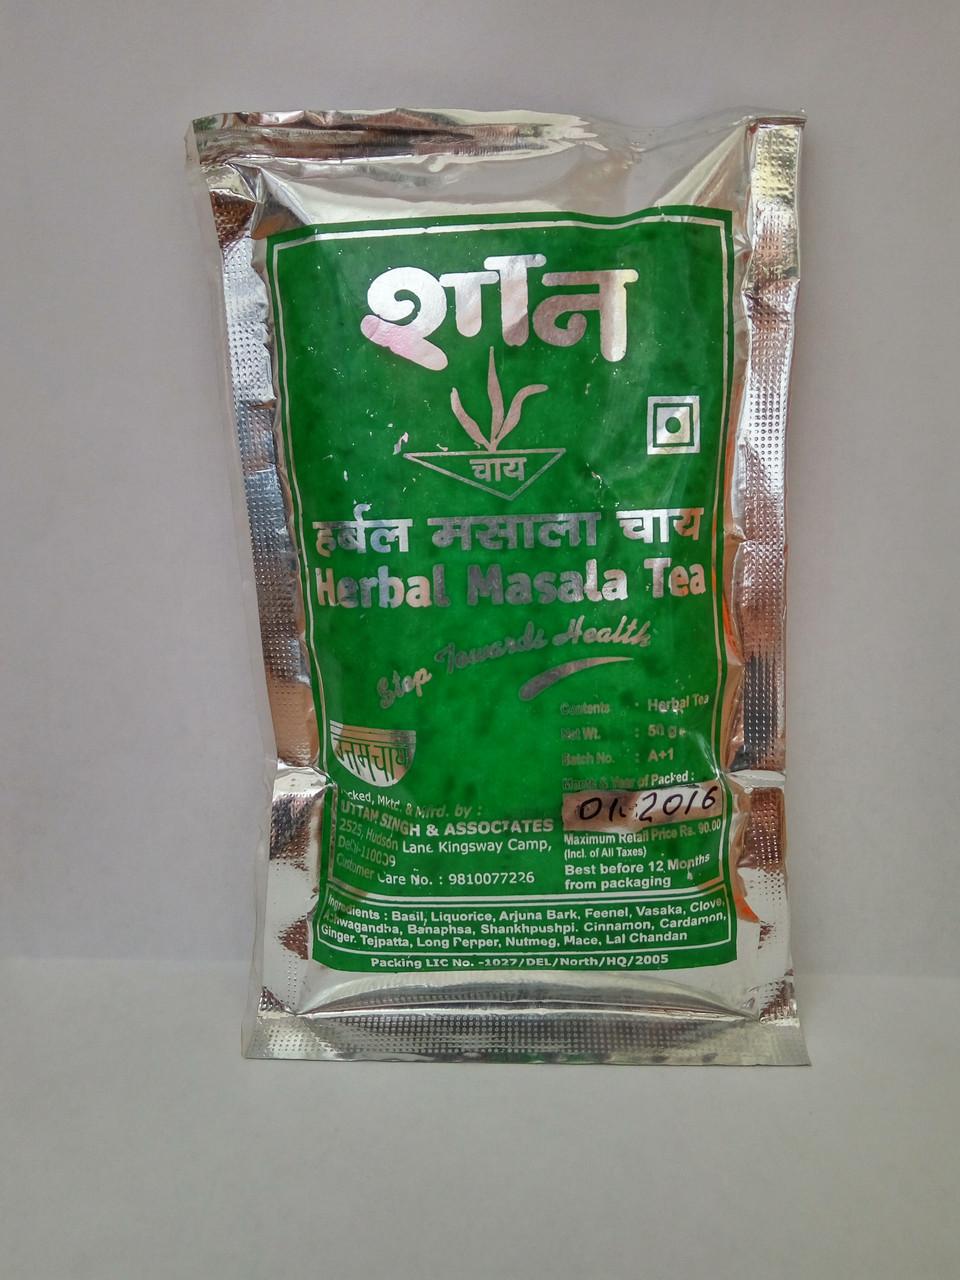 Хербал масала ти, Чай смесь трав, Herbal masala tea (50gm)